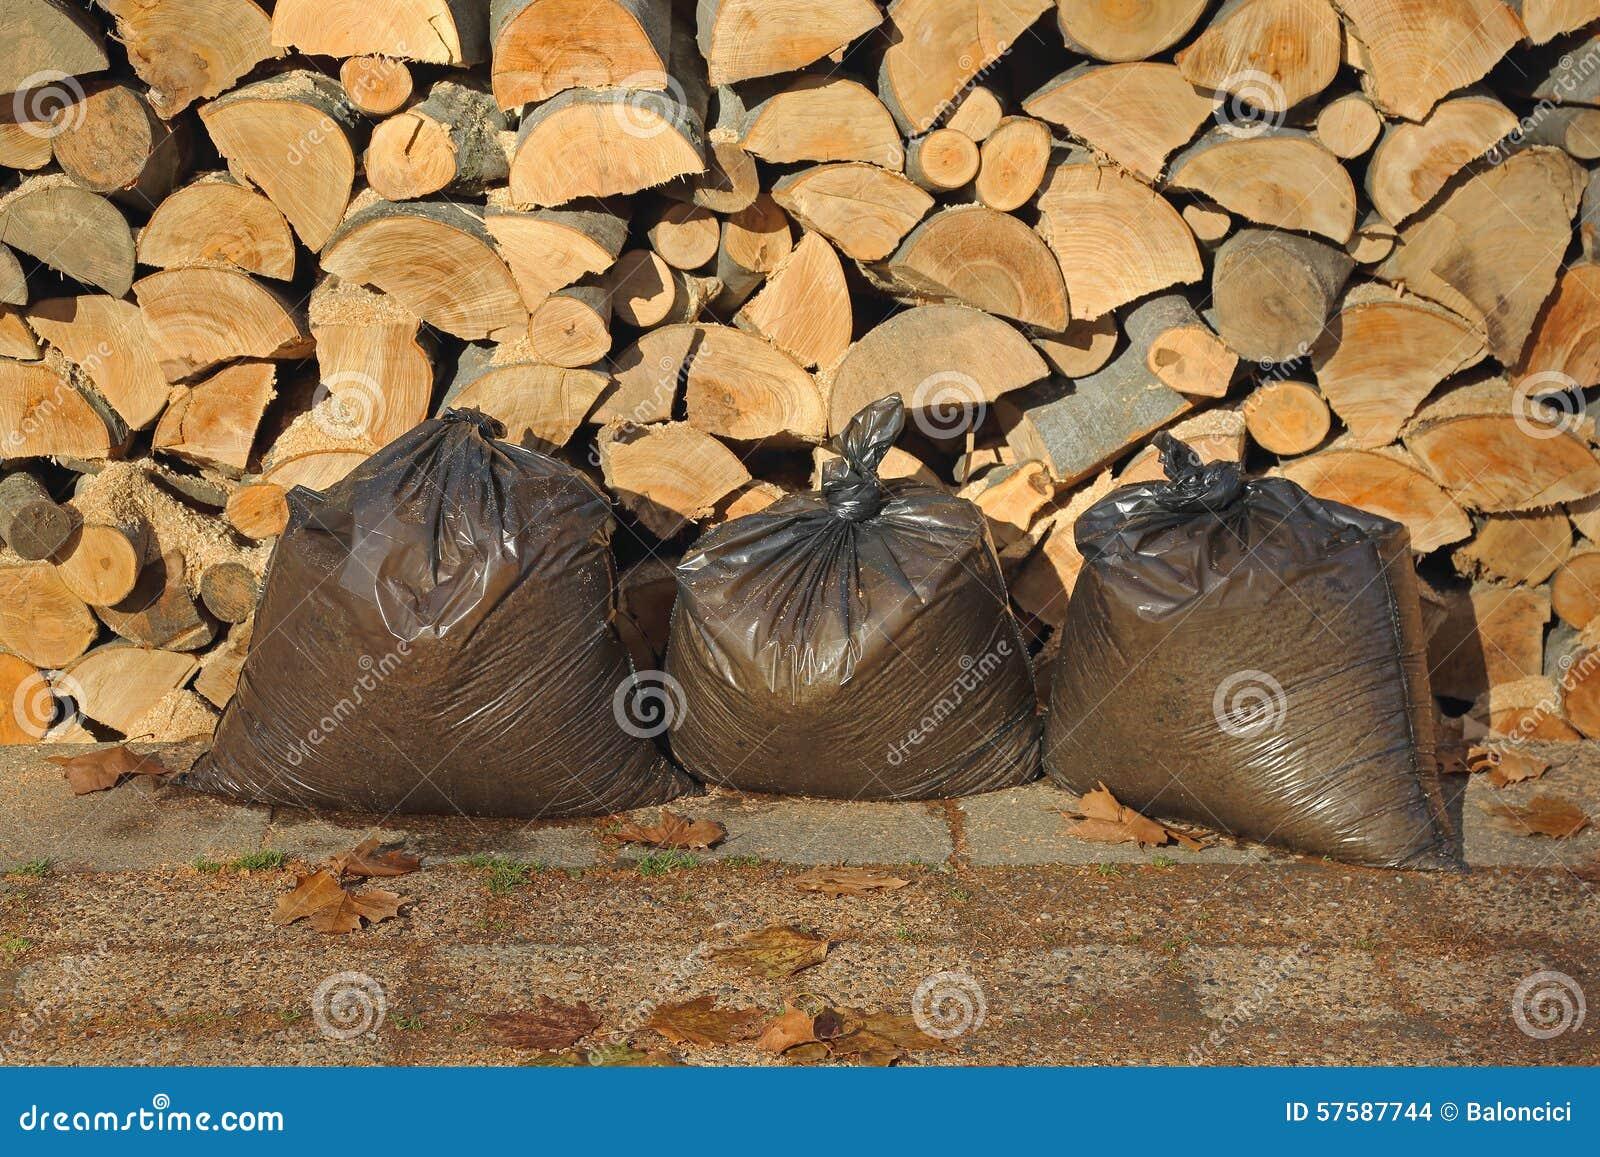 Firewood stock photo image